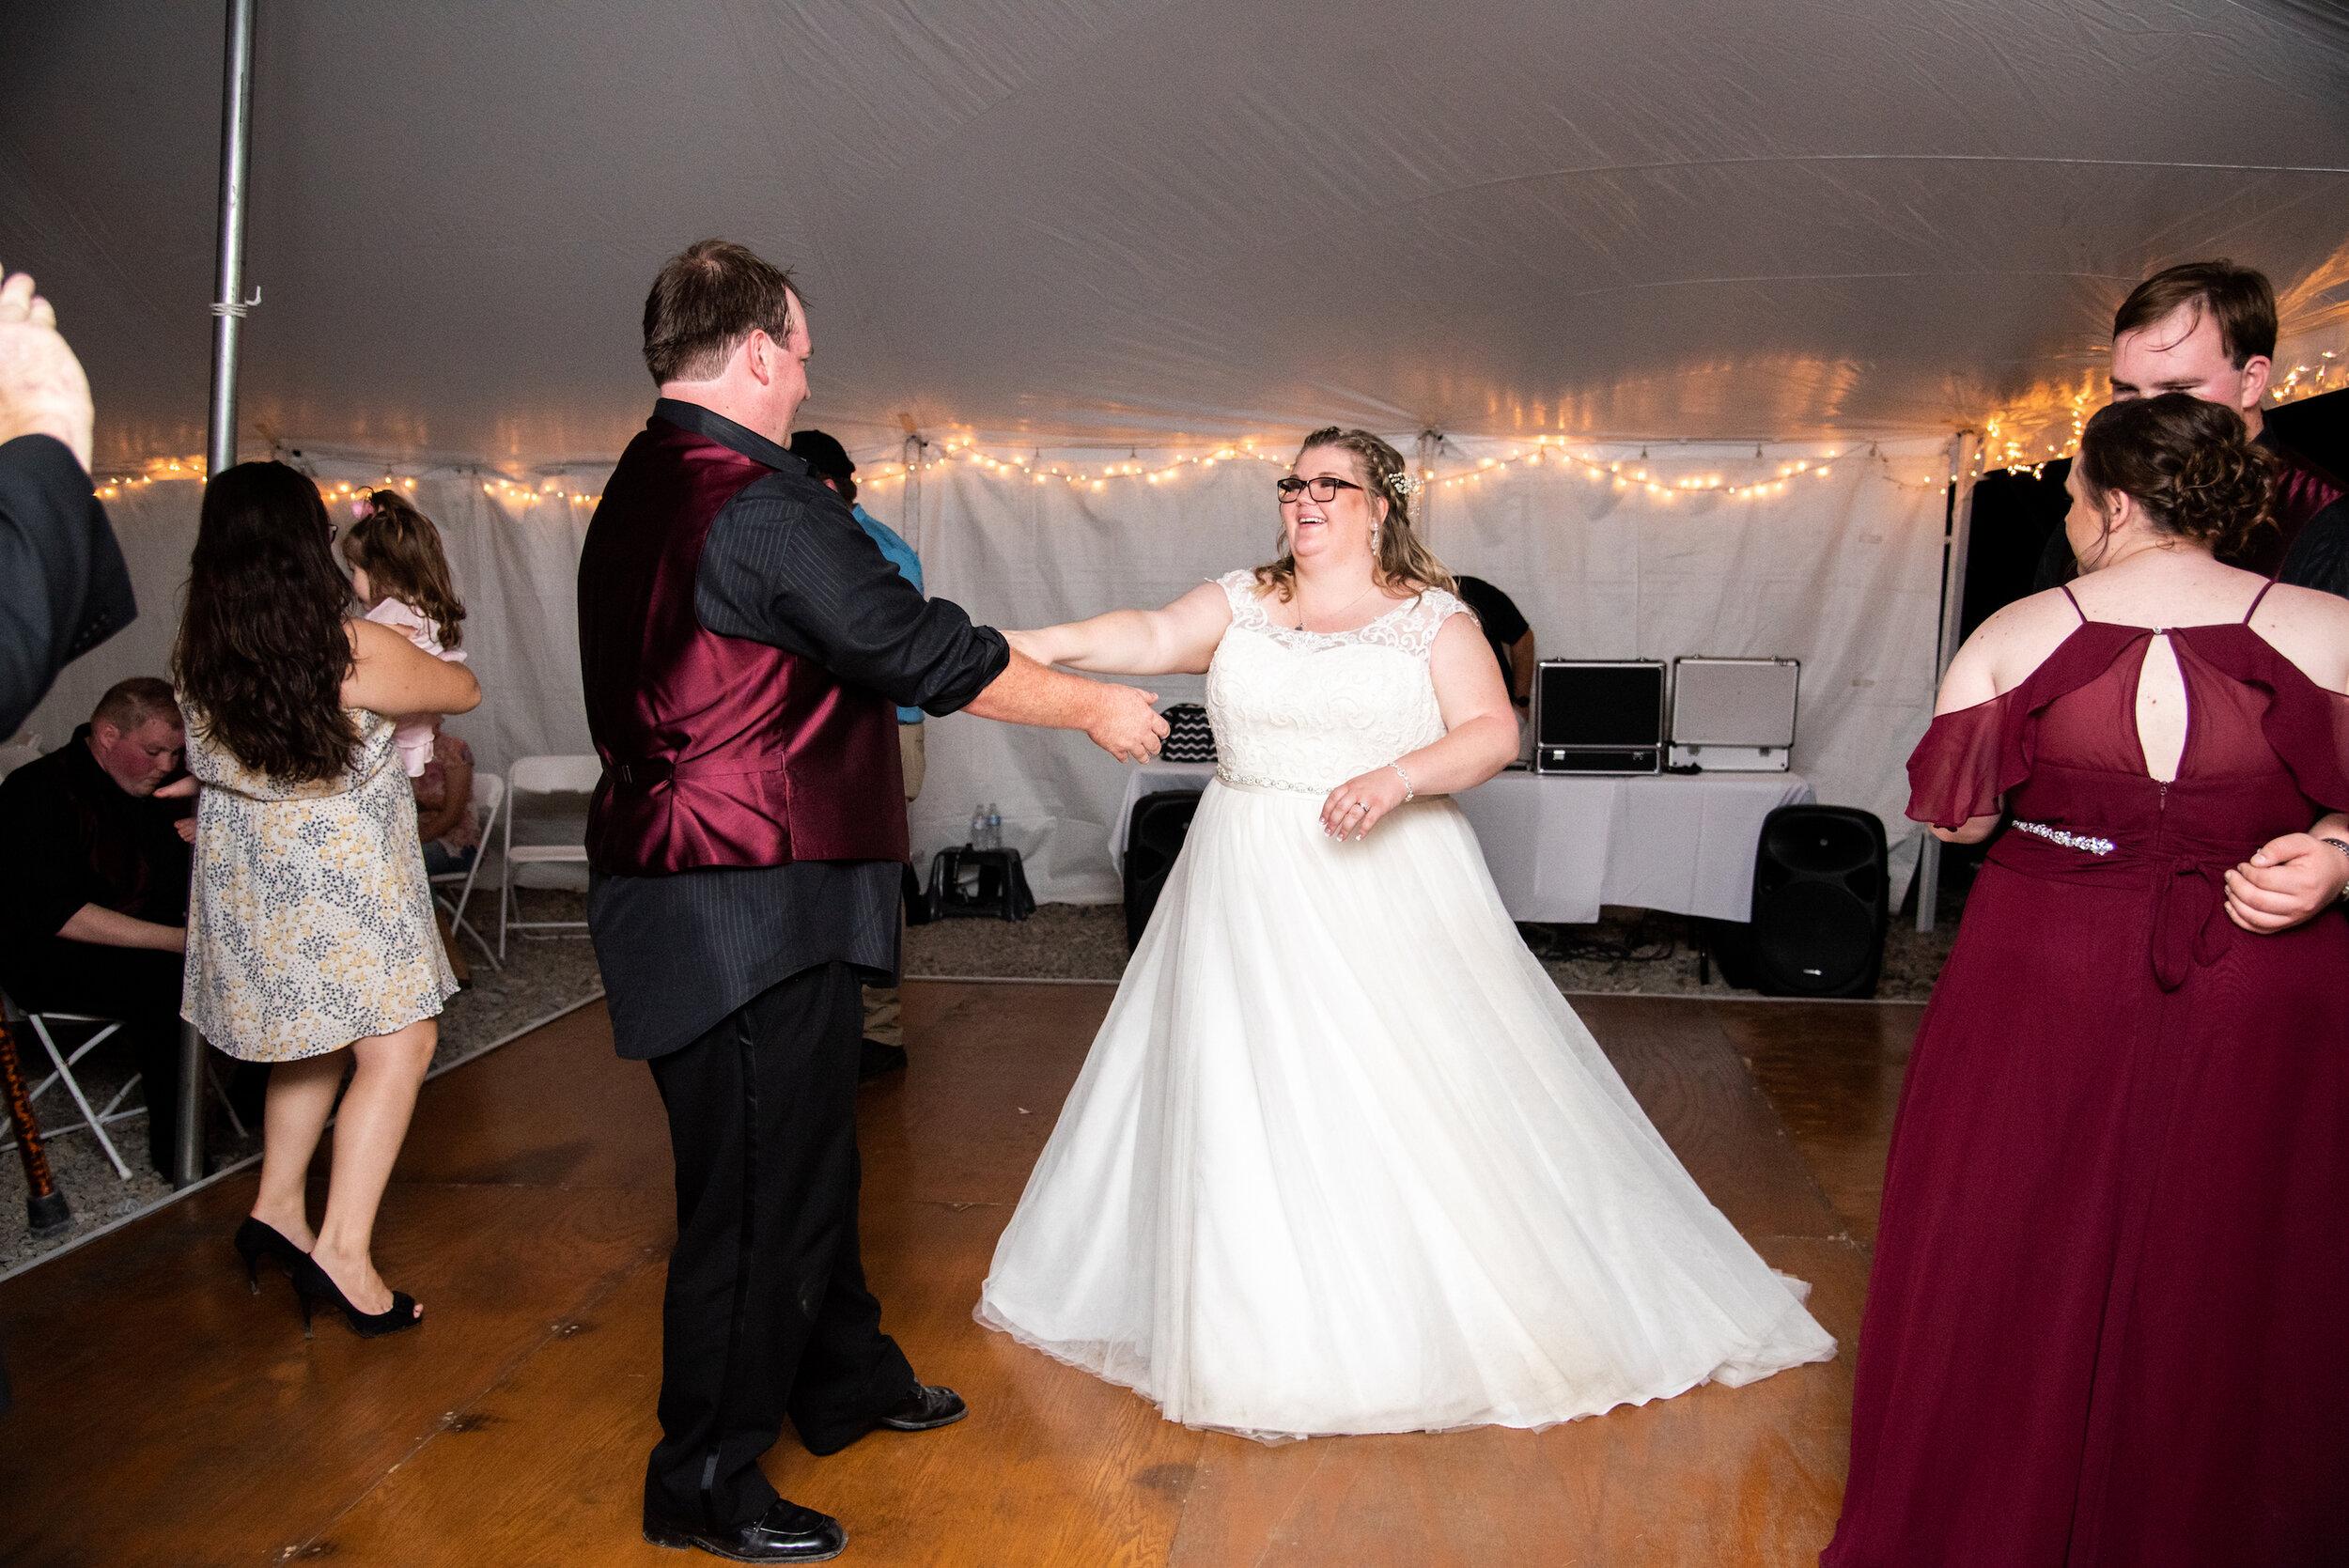 wedding (202 of 205).jpg